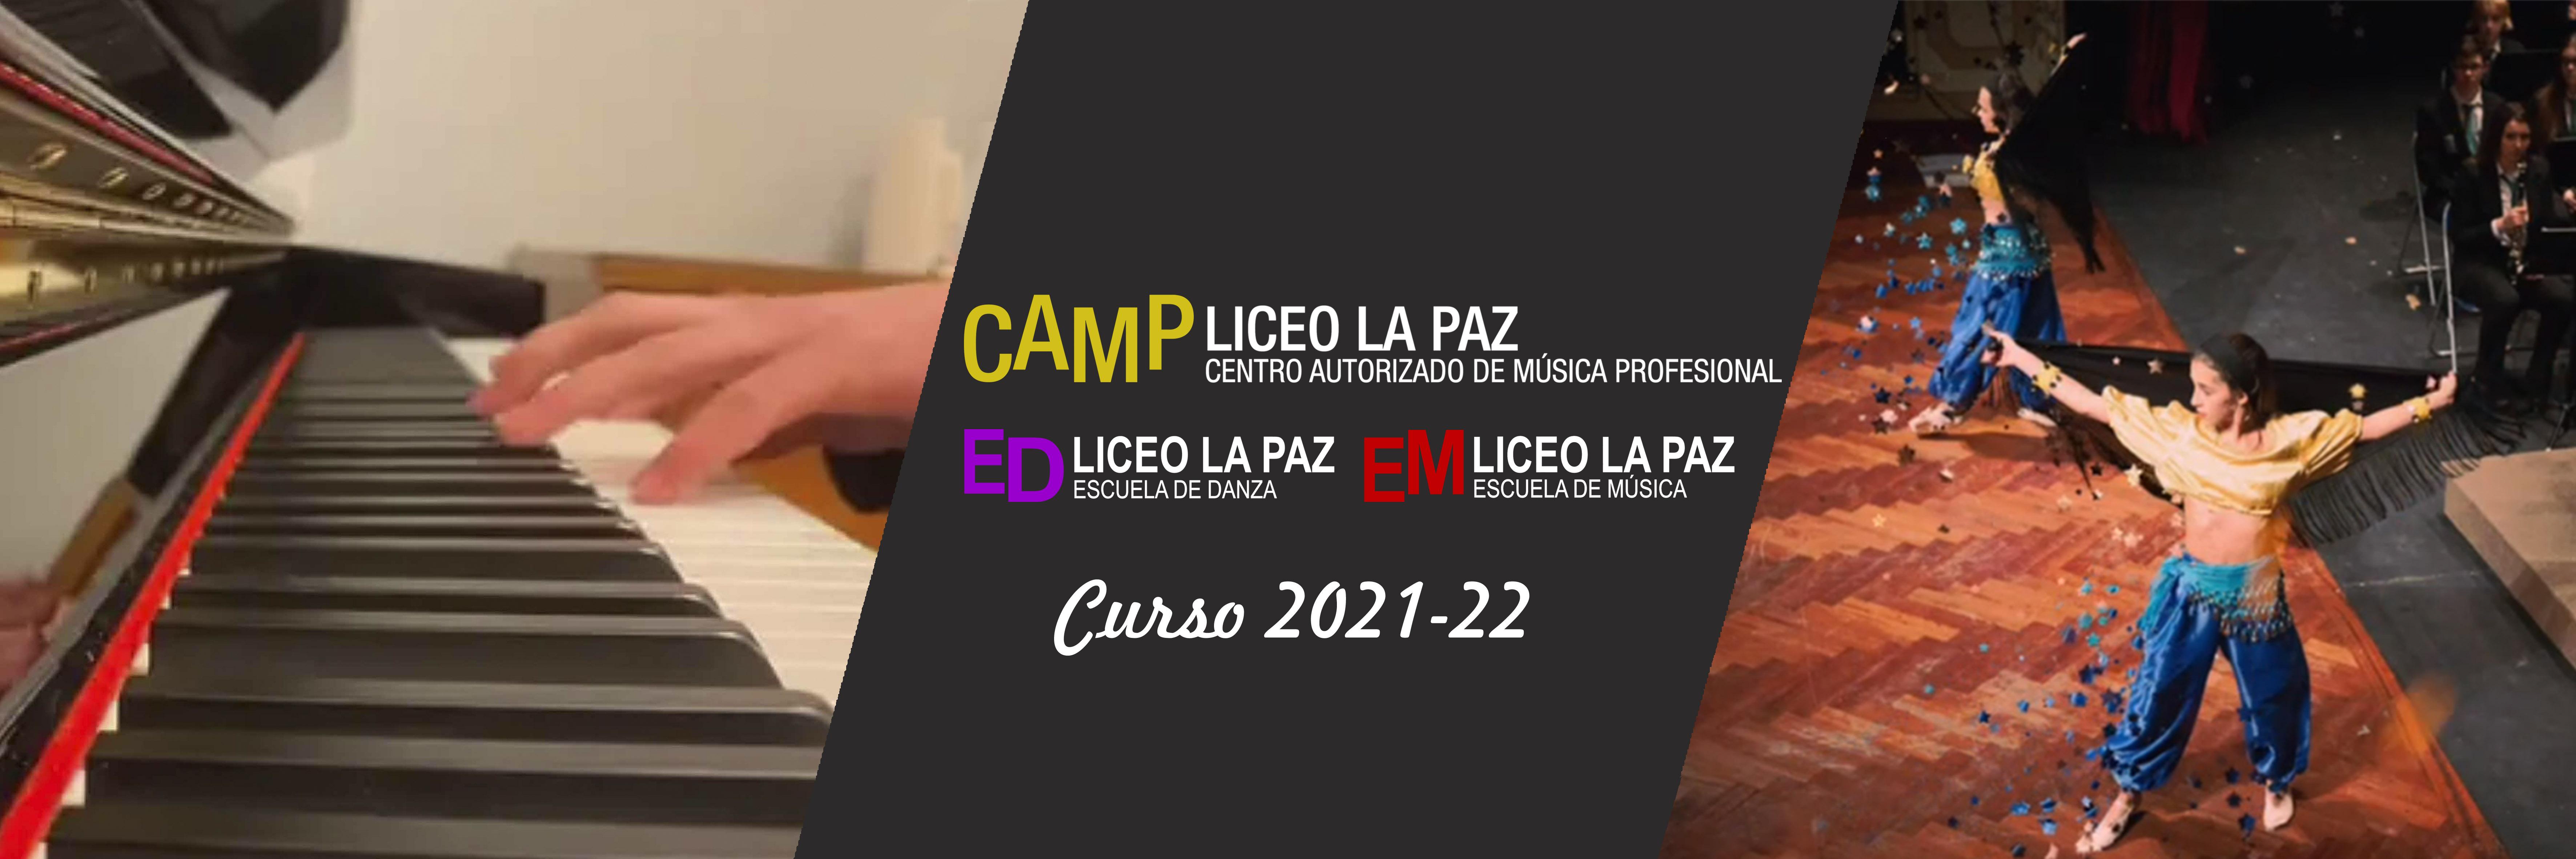 852x284_slide-CAMP-3